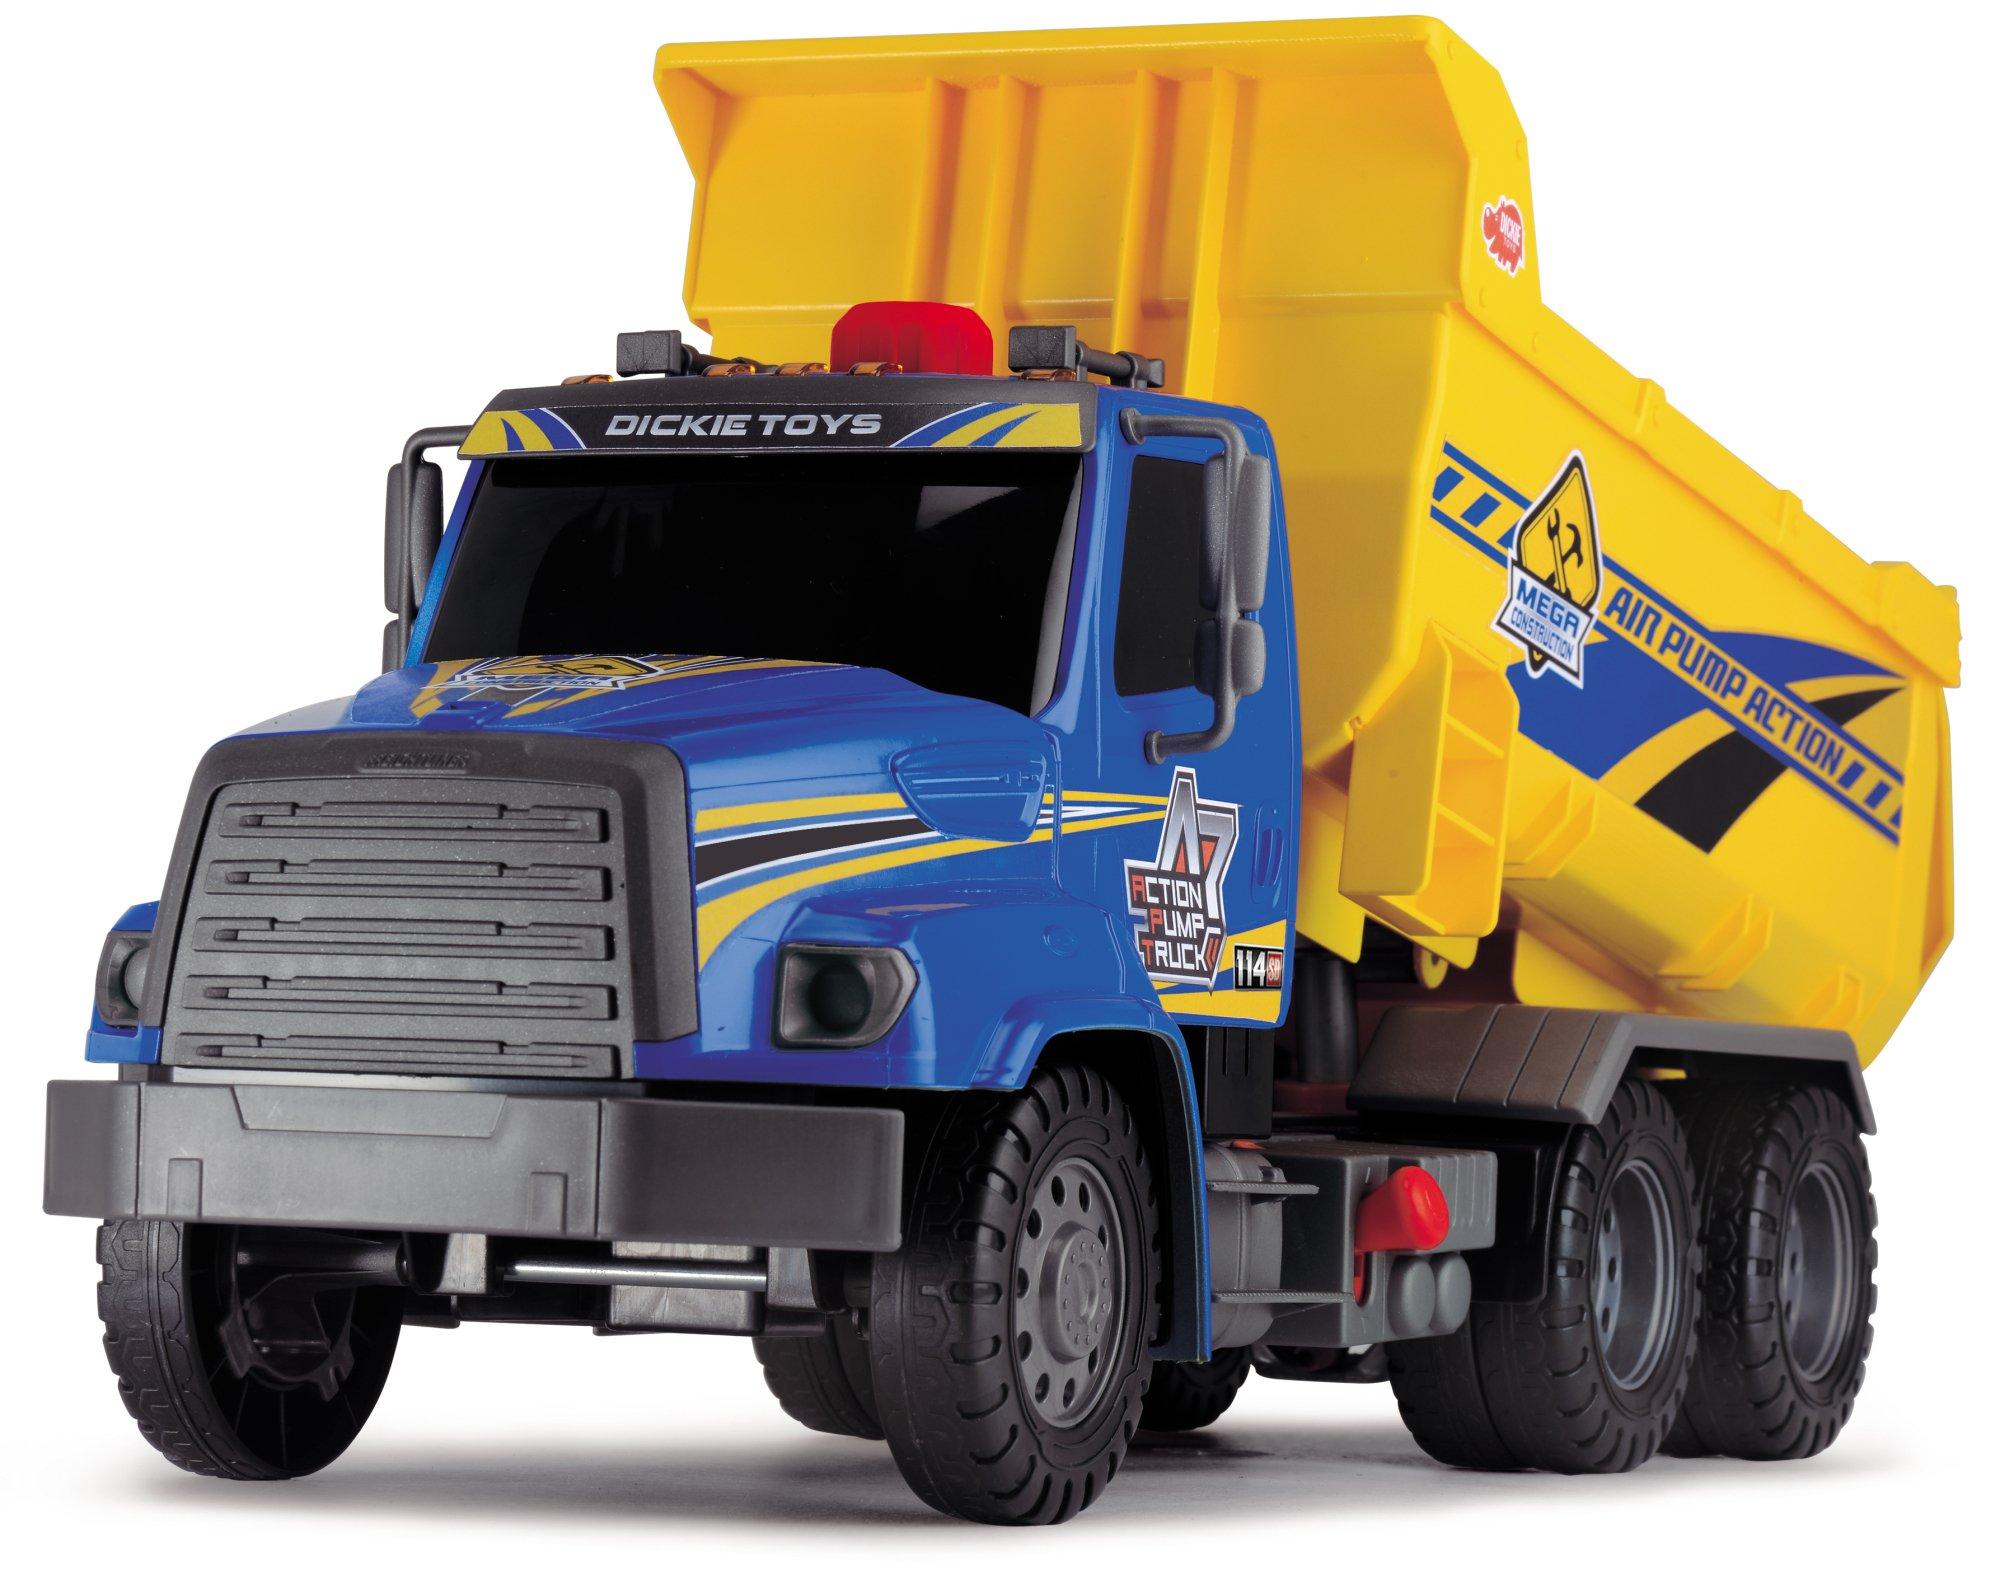 Dickie Toys Air Pump Action Dump Truck, 21''